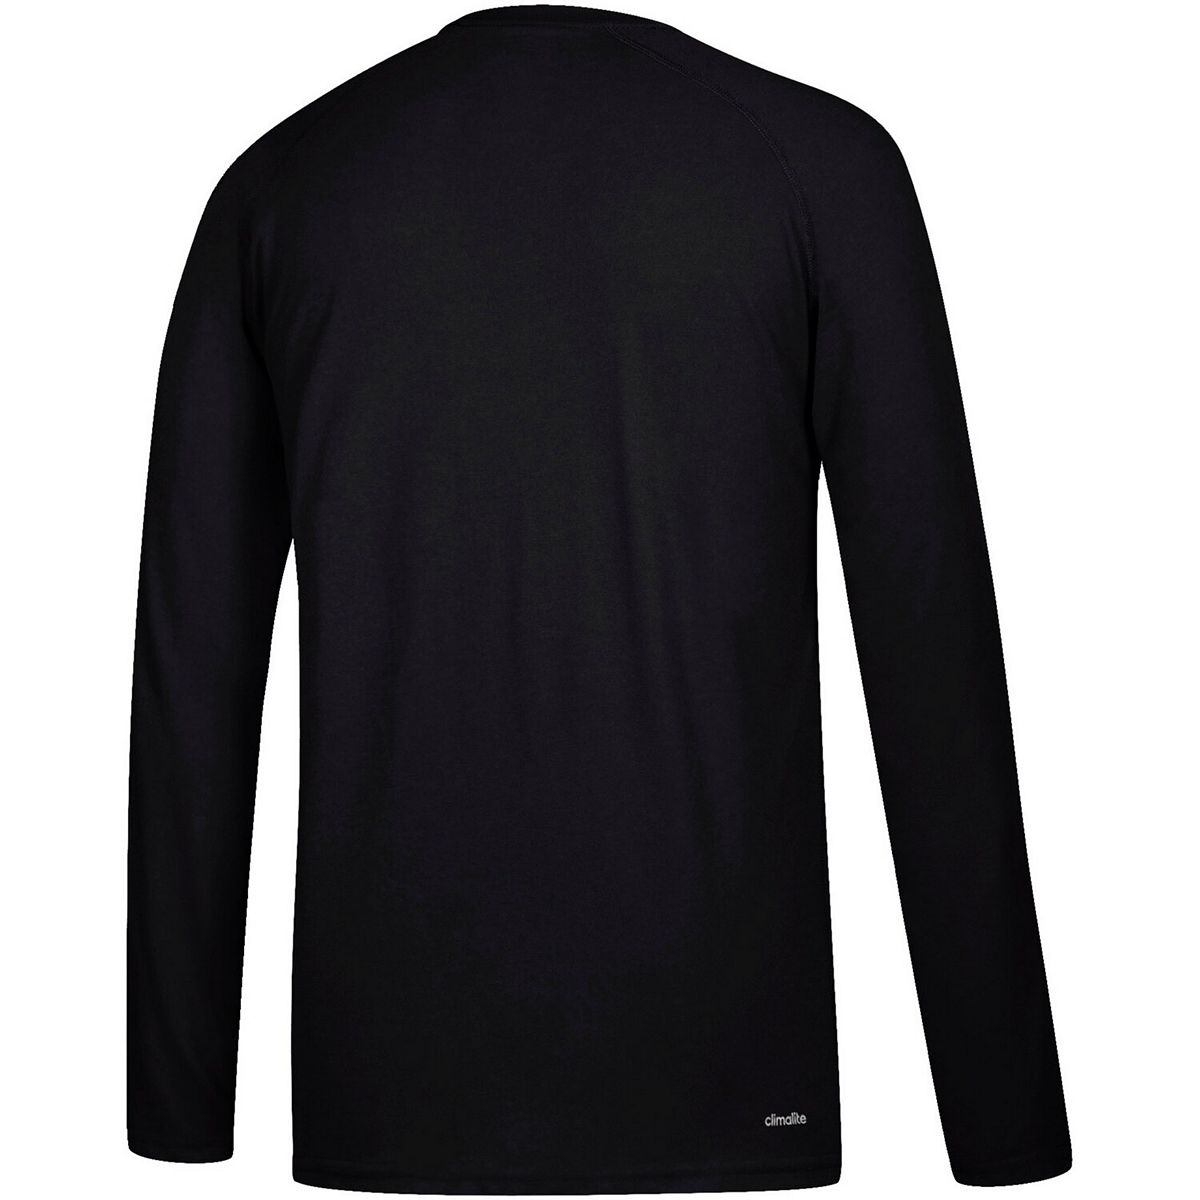 Men's adidas Black Philadelphia Flyers Local Ultimate Dassler Long Sleeve T-Shirt bJMbU